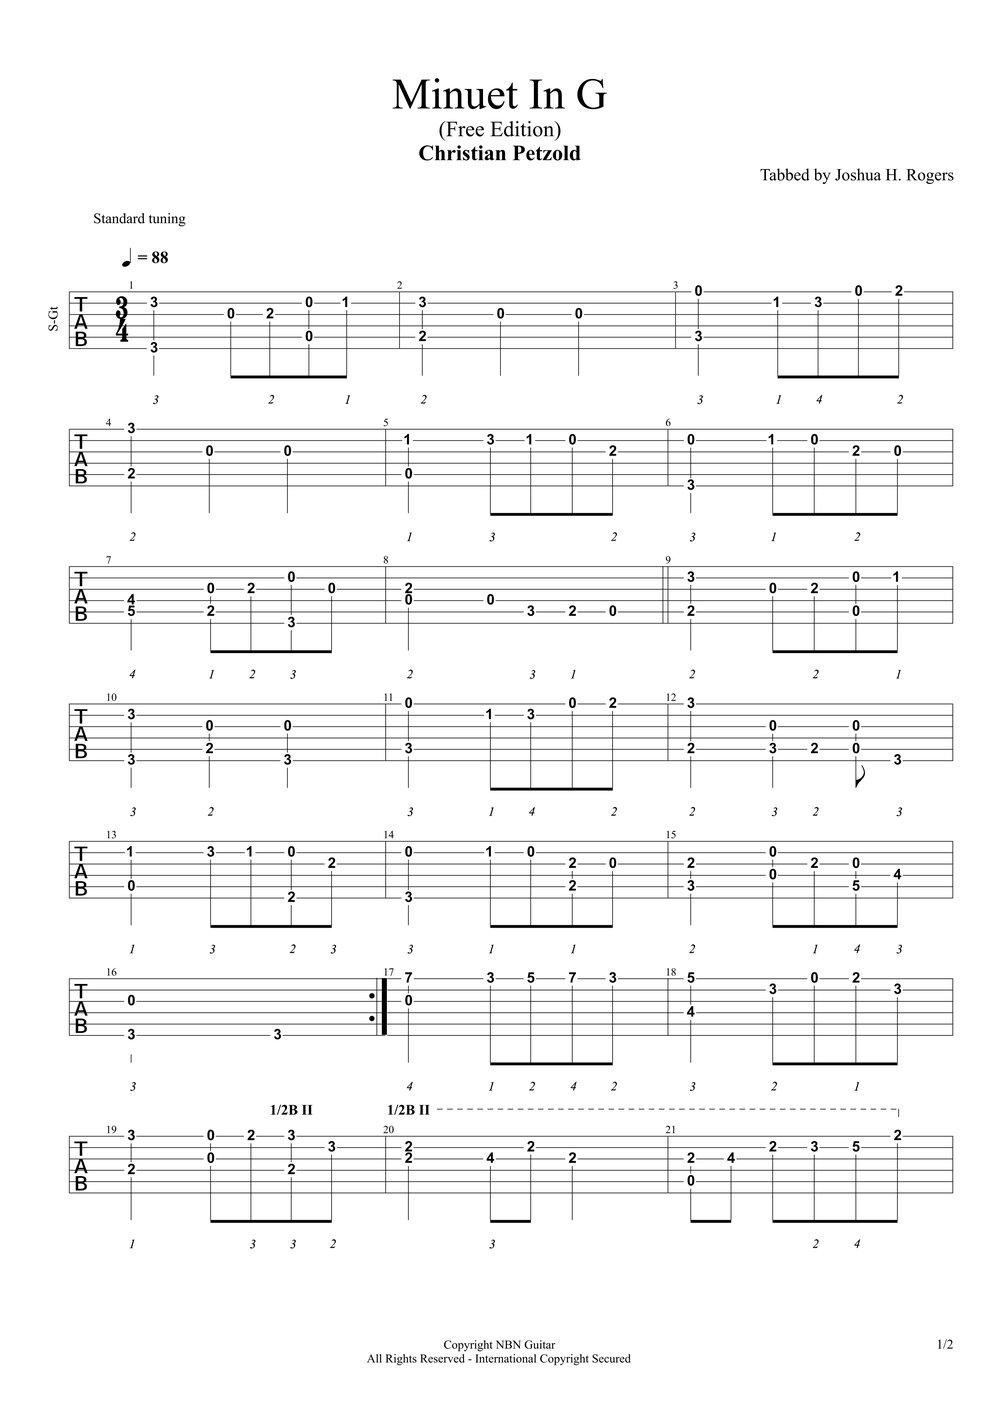 Minuet in G (Tabs)-p3.jpg